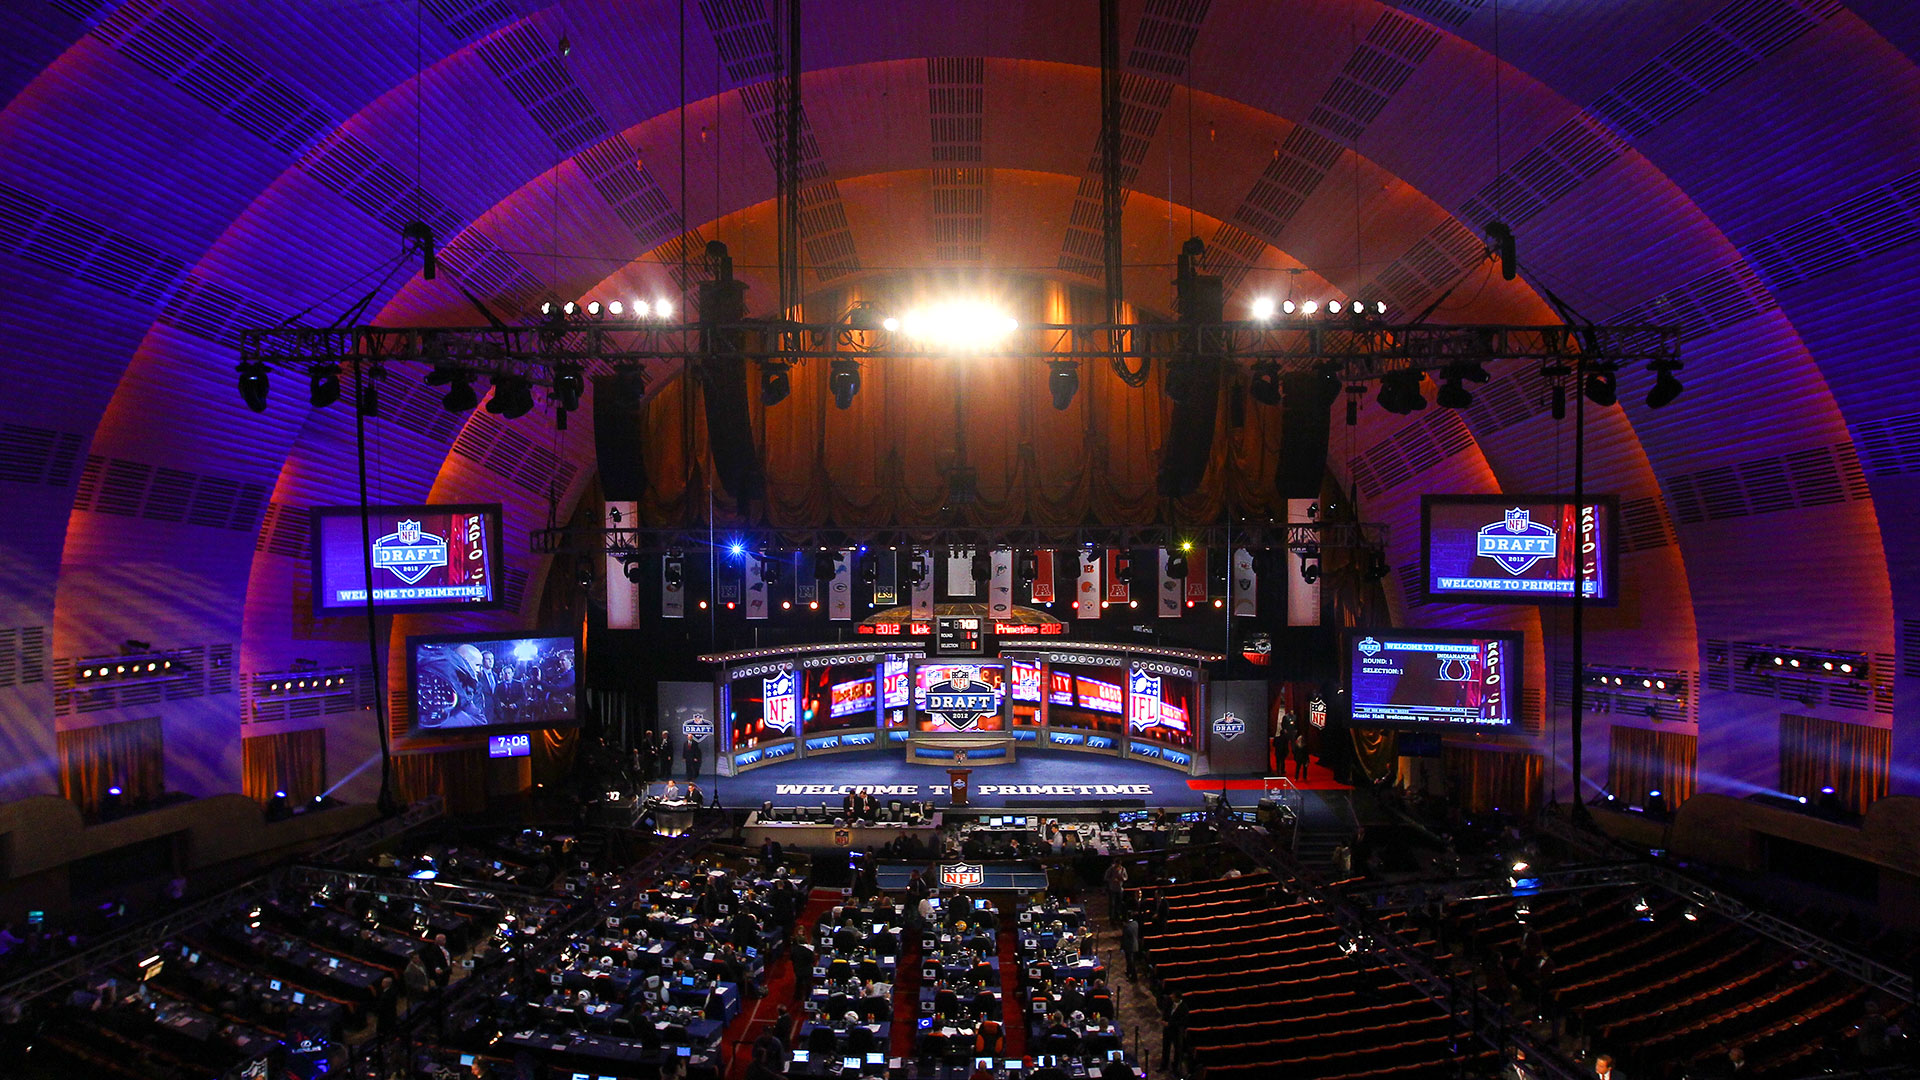 01-NFL-Draft-stage-043015-GETTY-FTR.jpg